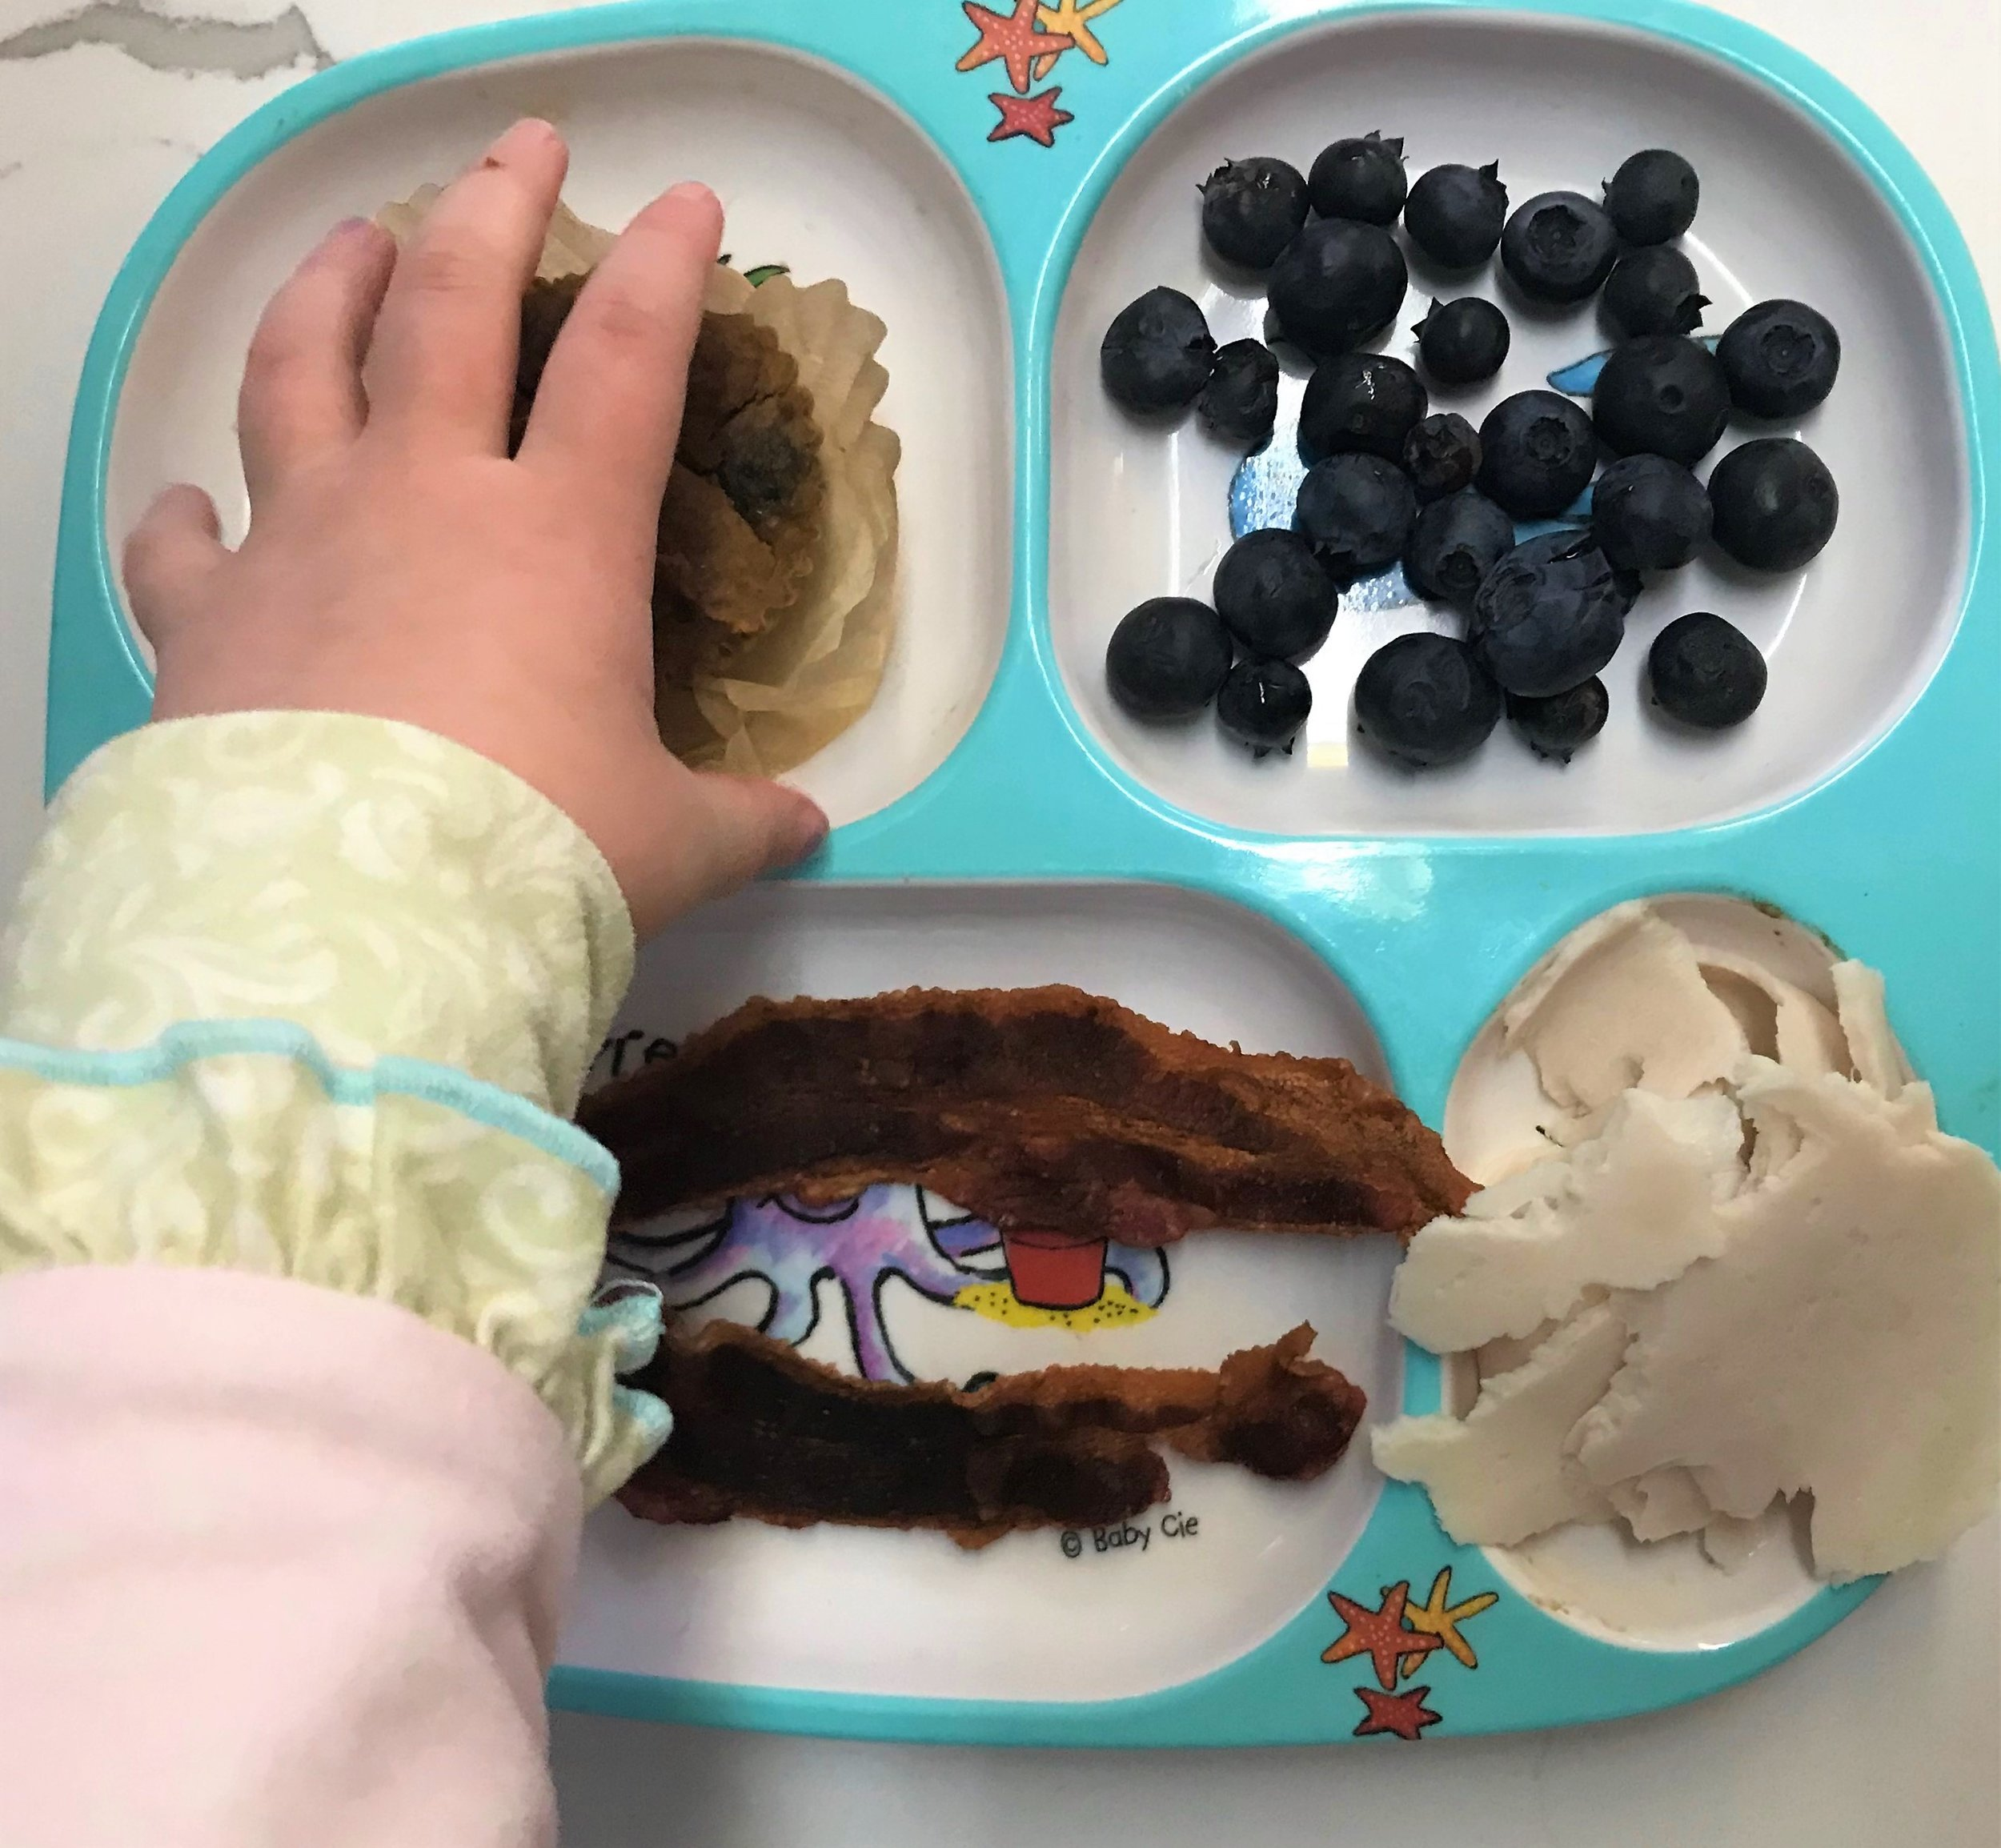 Top left: homemade banana muffin  Top right: blueberries  Bottom left: bacon, duh  Bottom right: Turkey